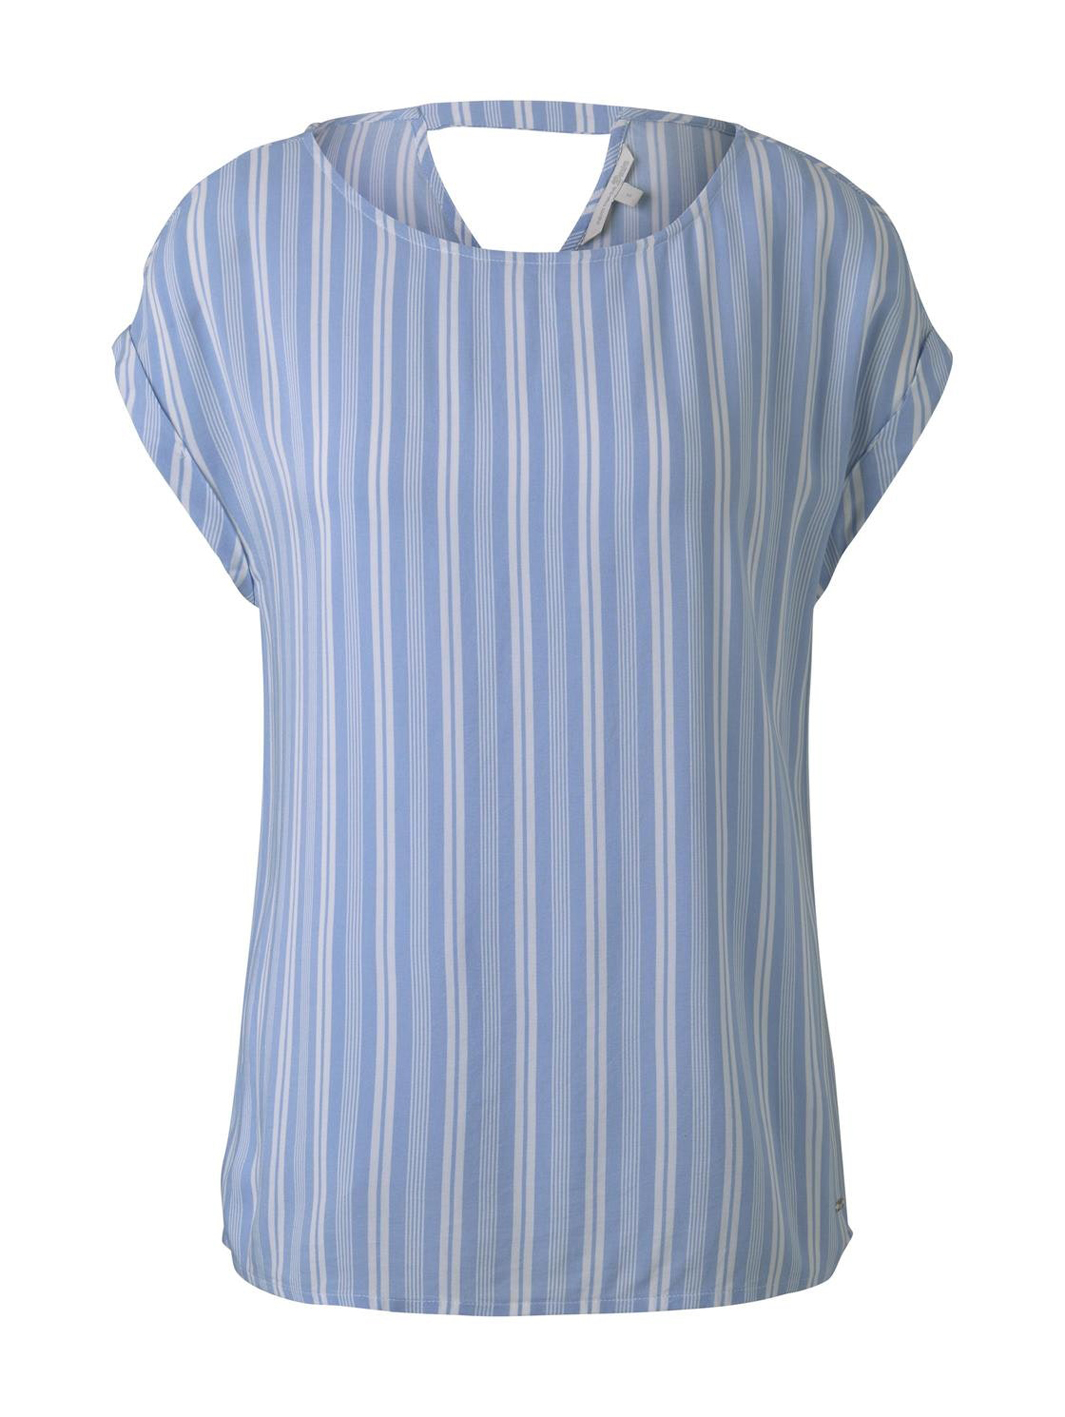 Tom Tailor gestreiftes Blusenshirt blau